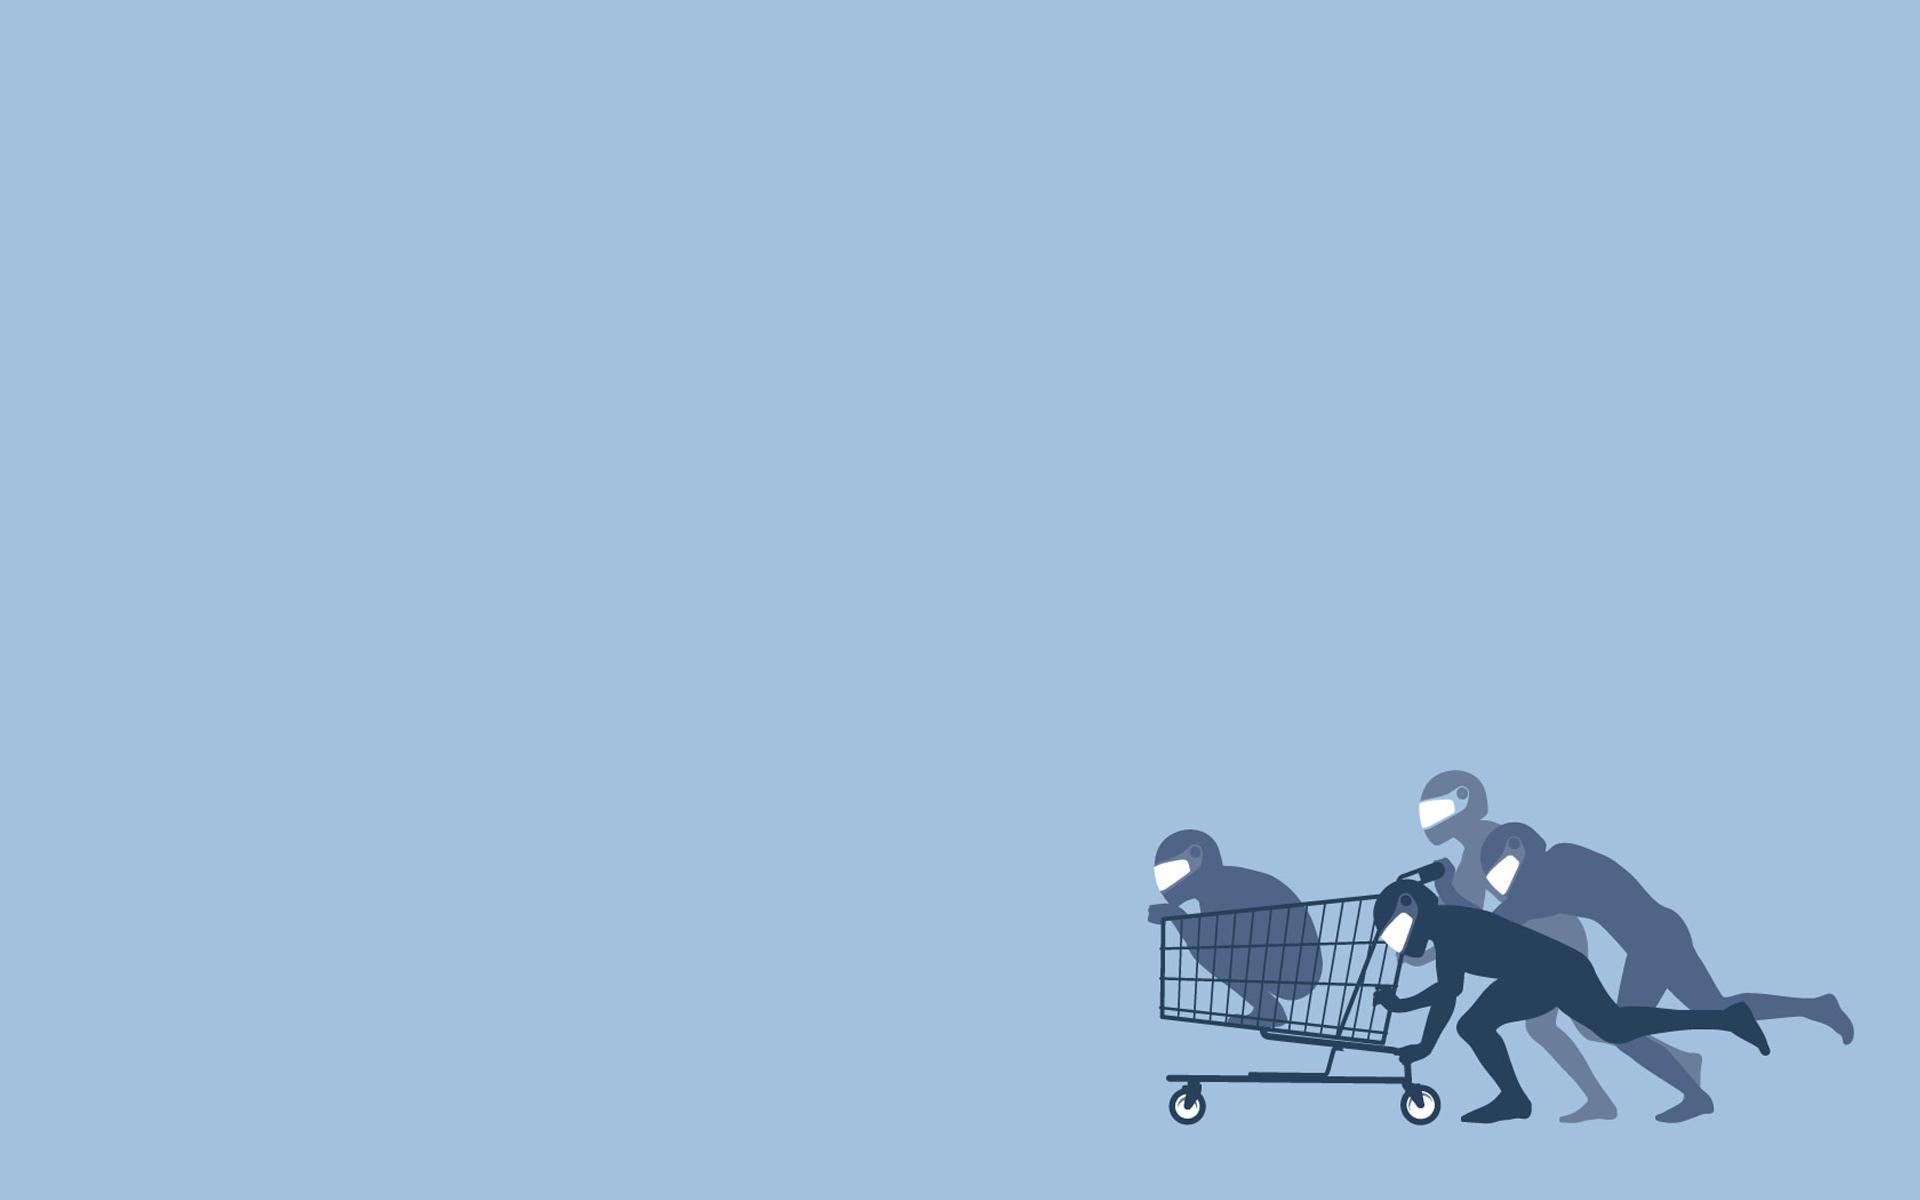 Threadless cart fun art | Minimal Wallpapers | Pinterest | Fun ...